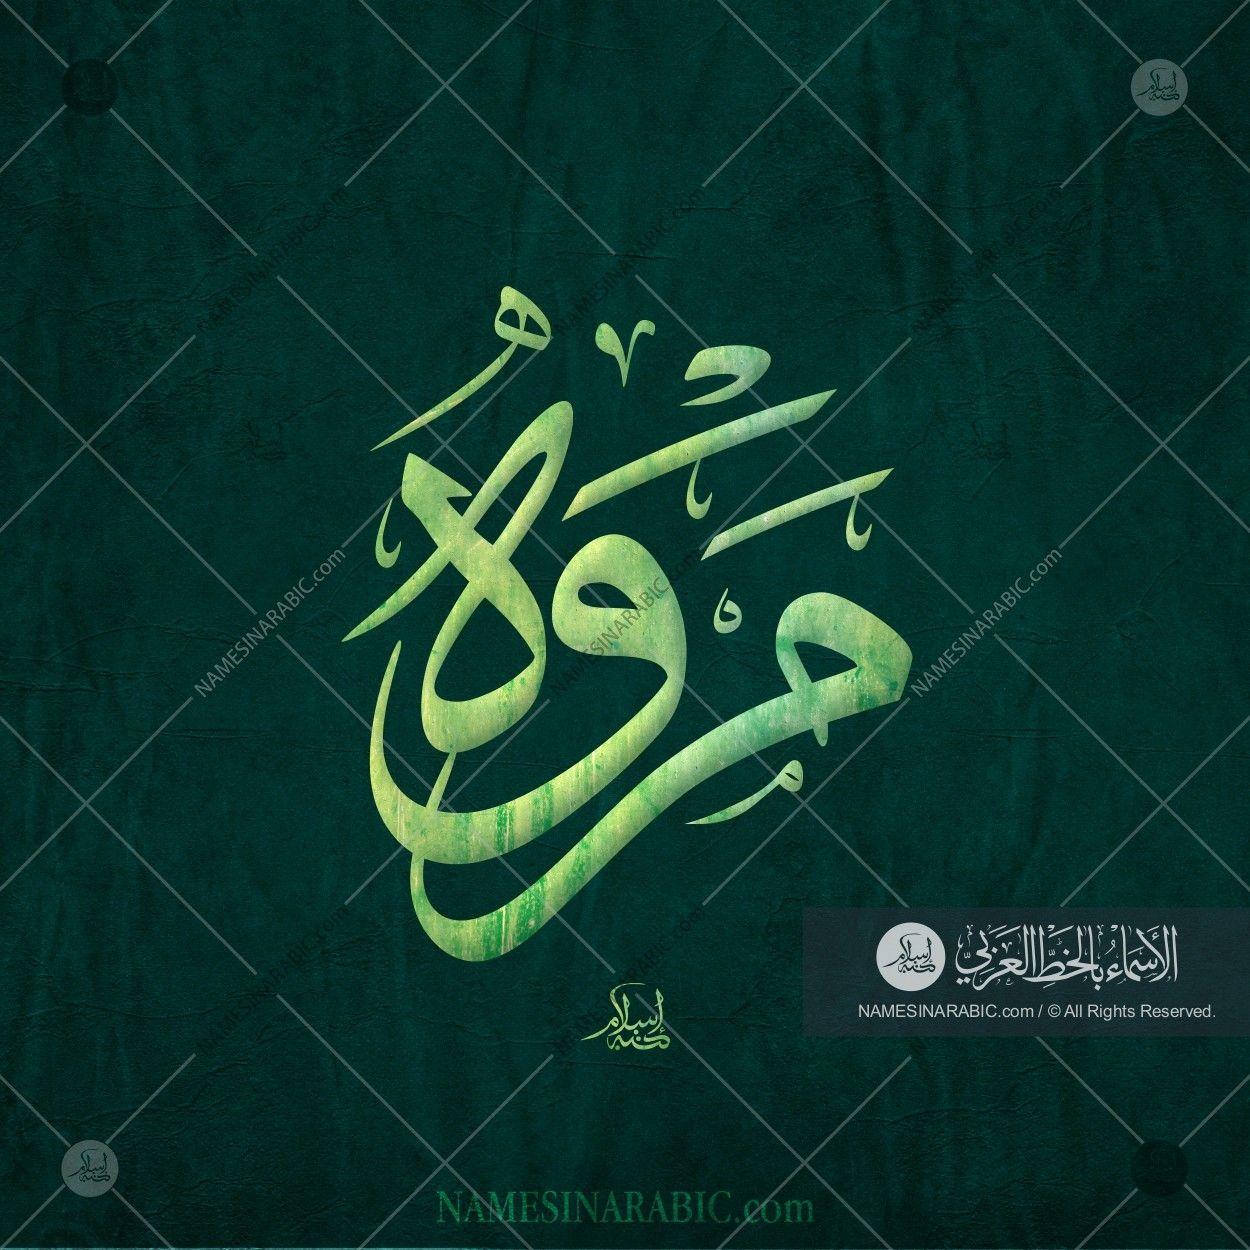 Marwa مروه Names In Arabic Calligraphy Name 7475 Calligraphy Name Calligraphy Arabic Art